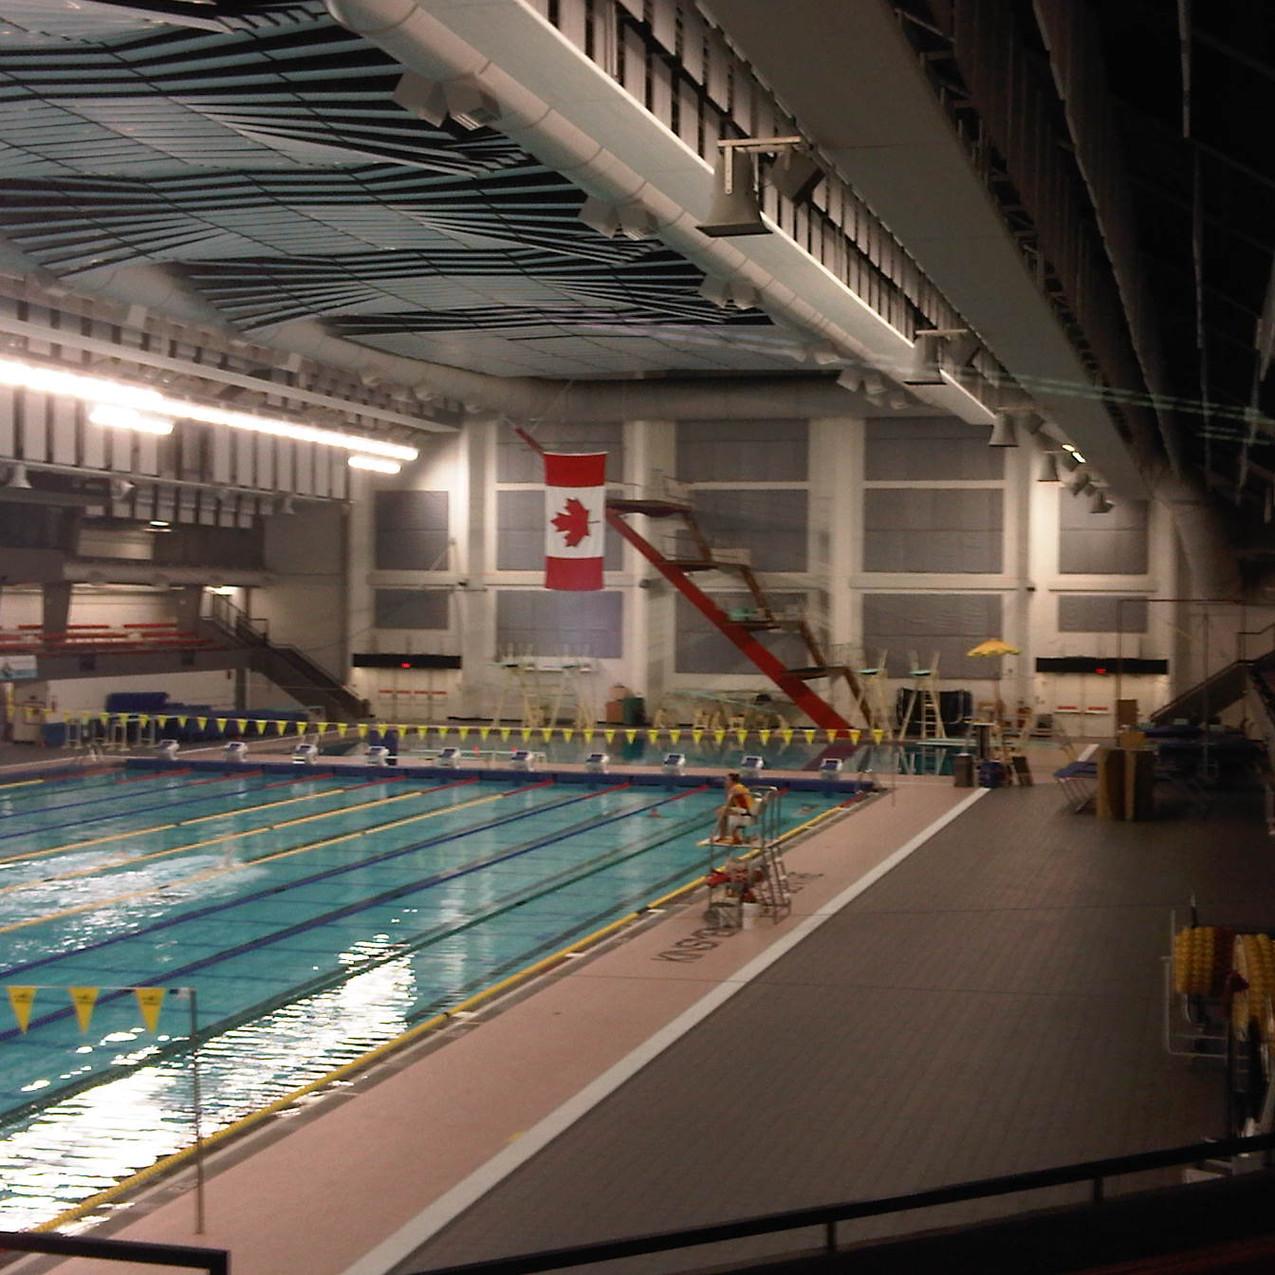 #8 - Edmonton Kinsmen Centre